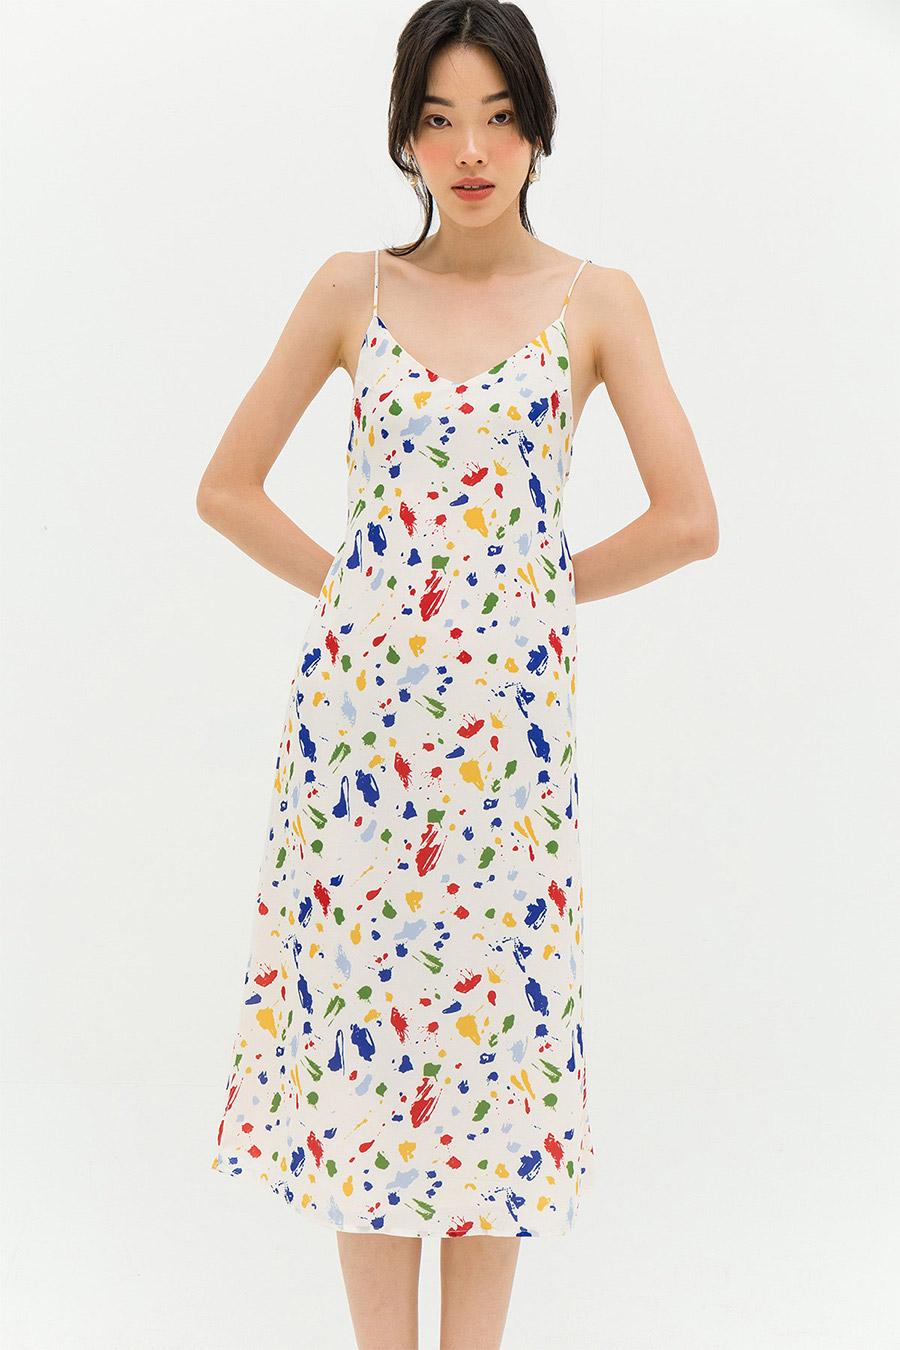 *BO* SIMON DRESS - ART ATTACK